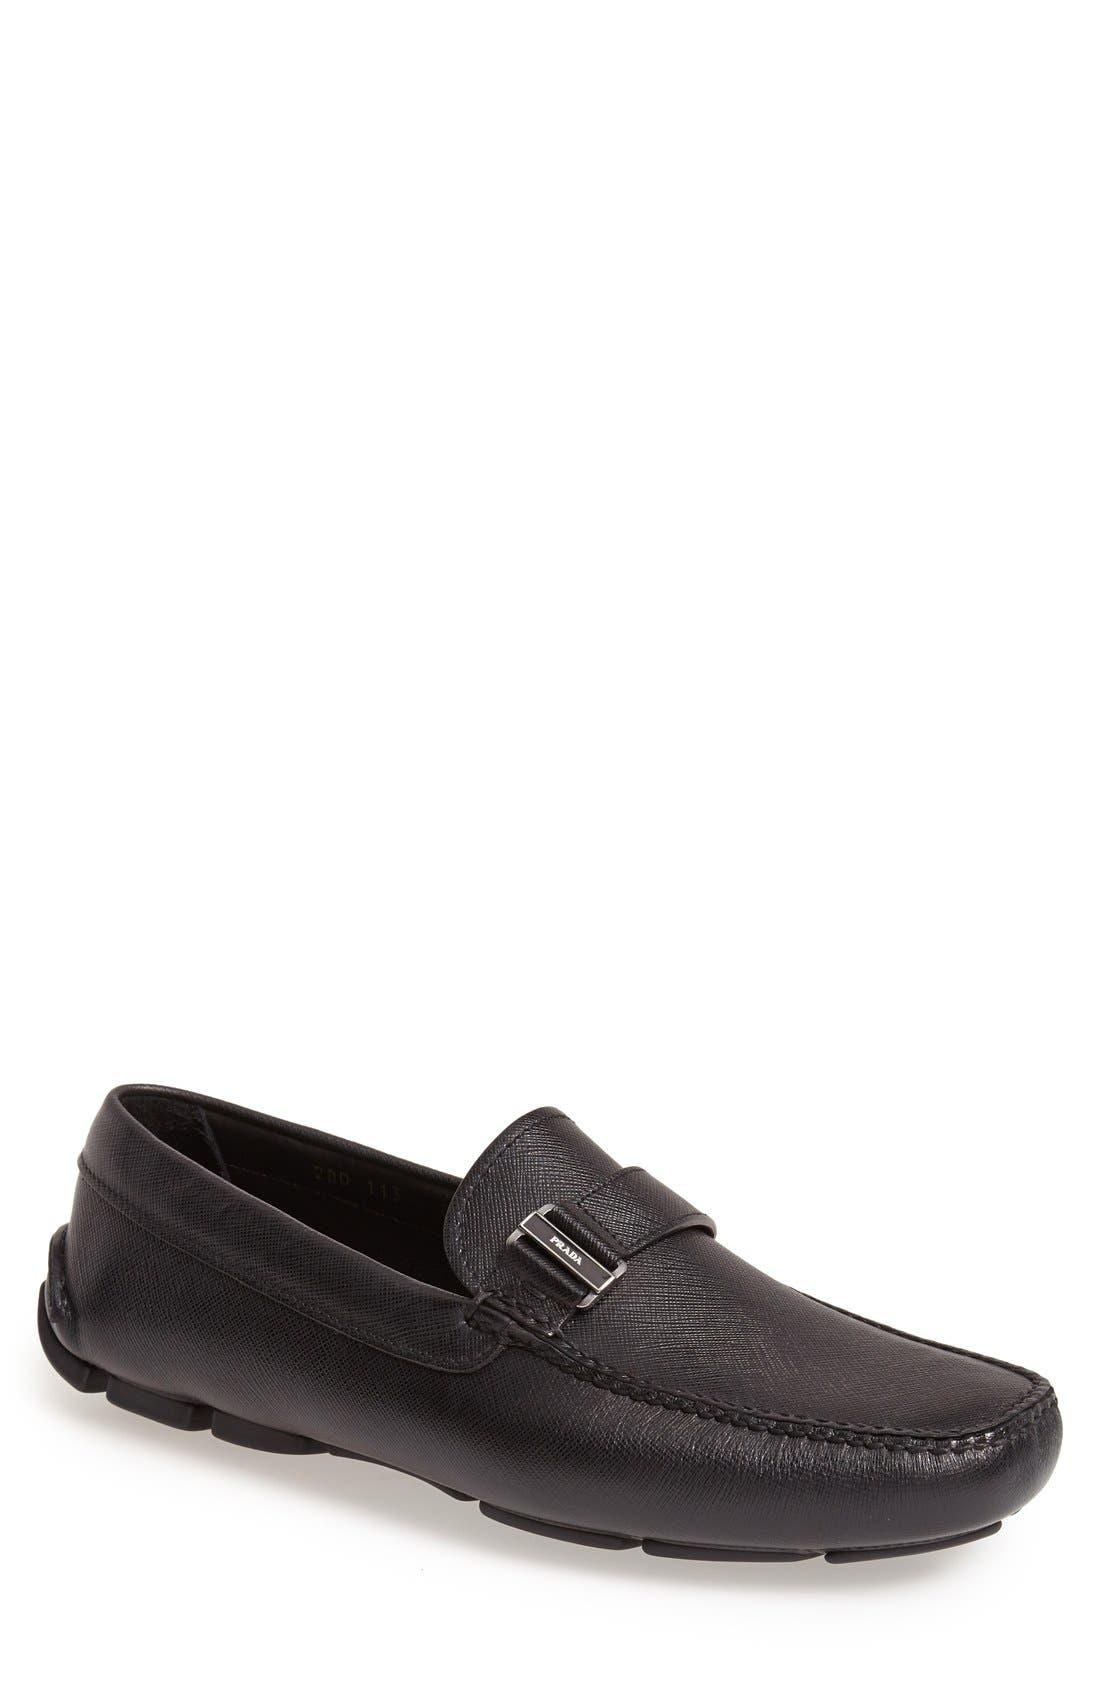 Main Image - Prada Saffiano Leather Driving Shoe (Men)